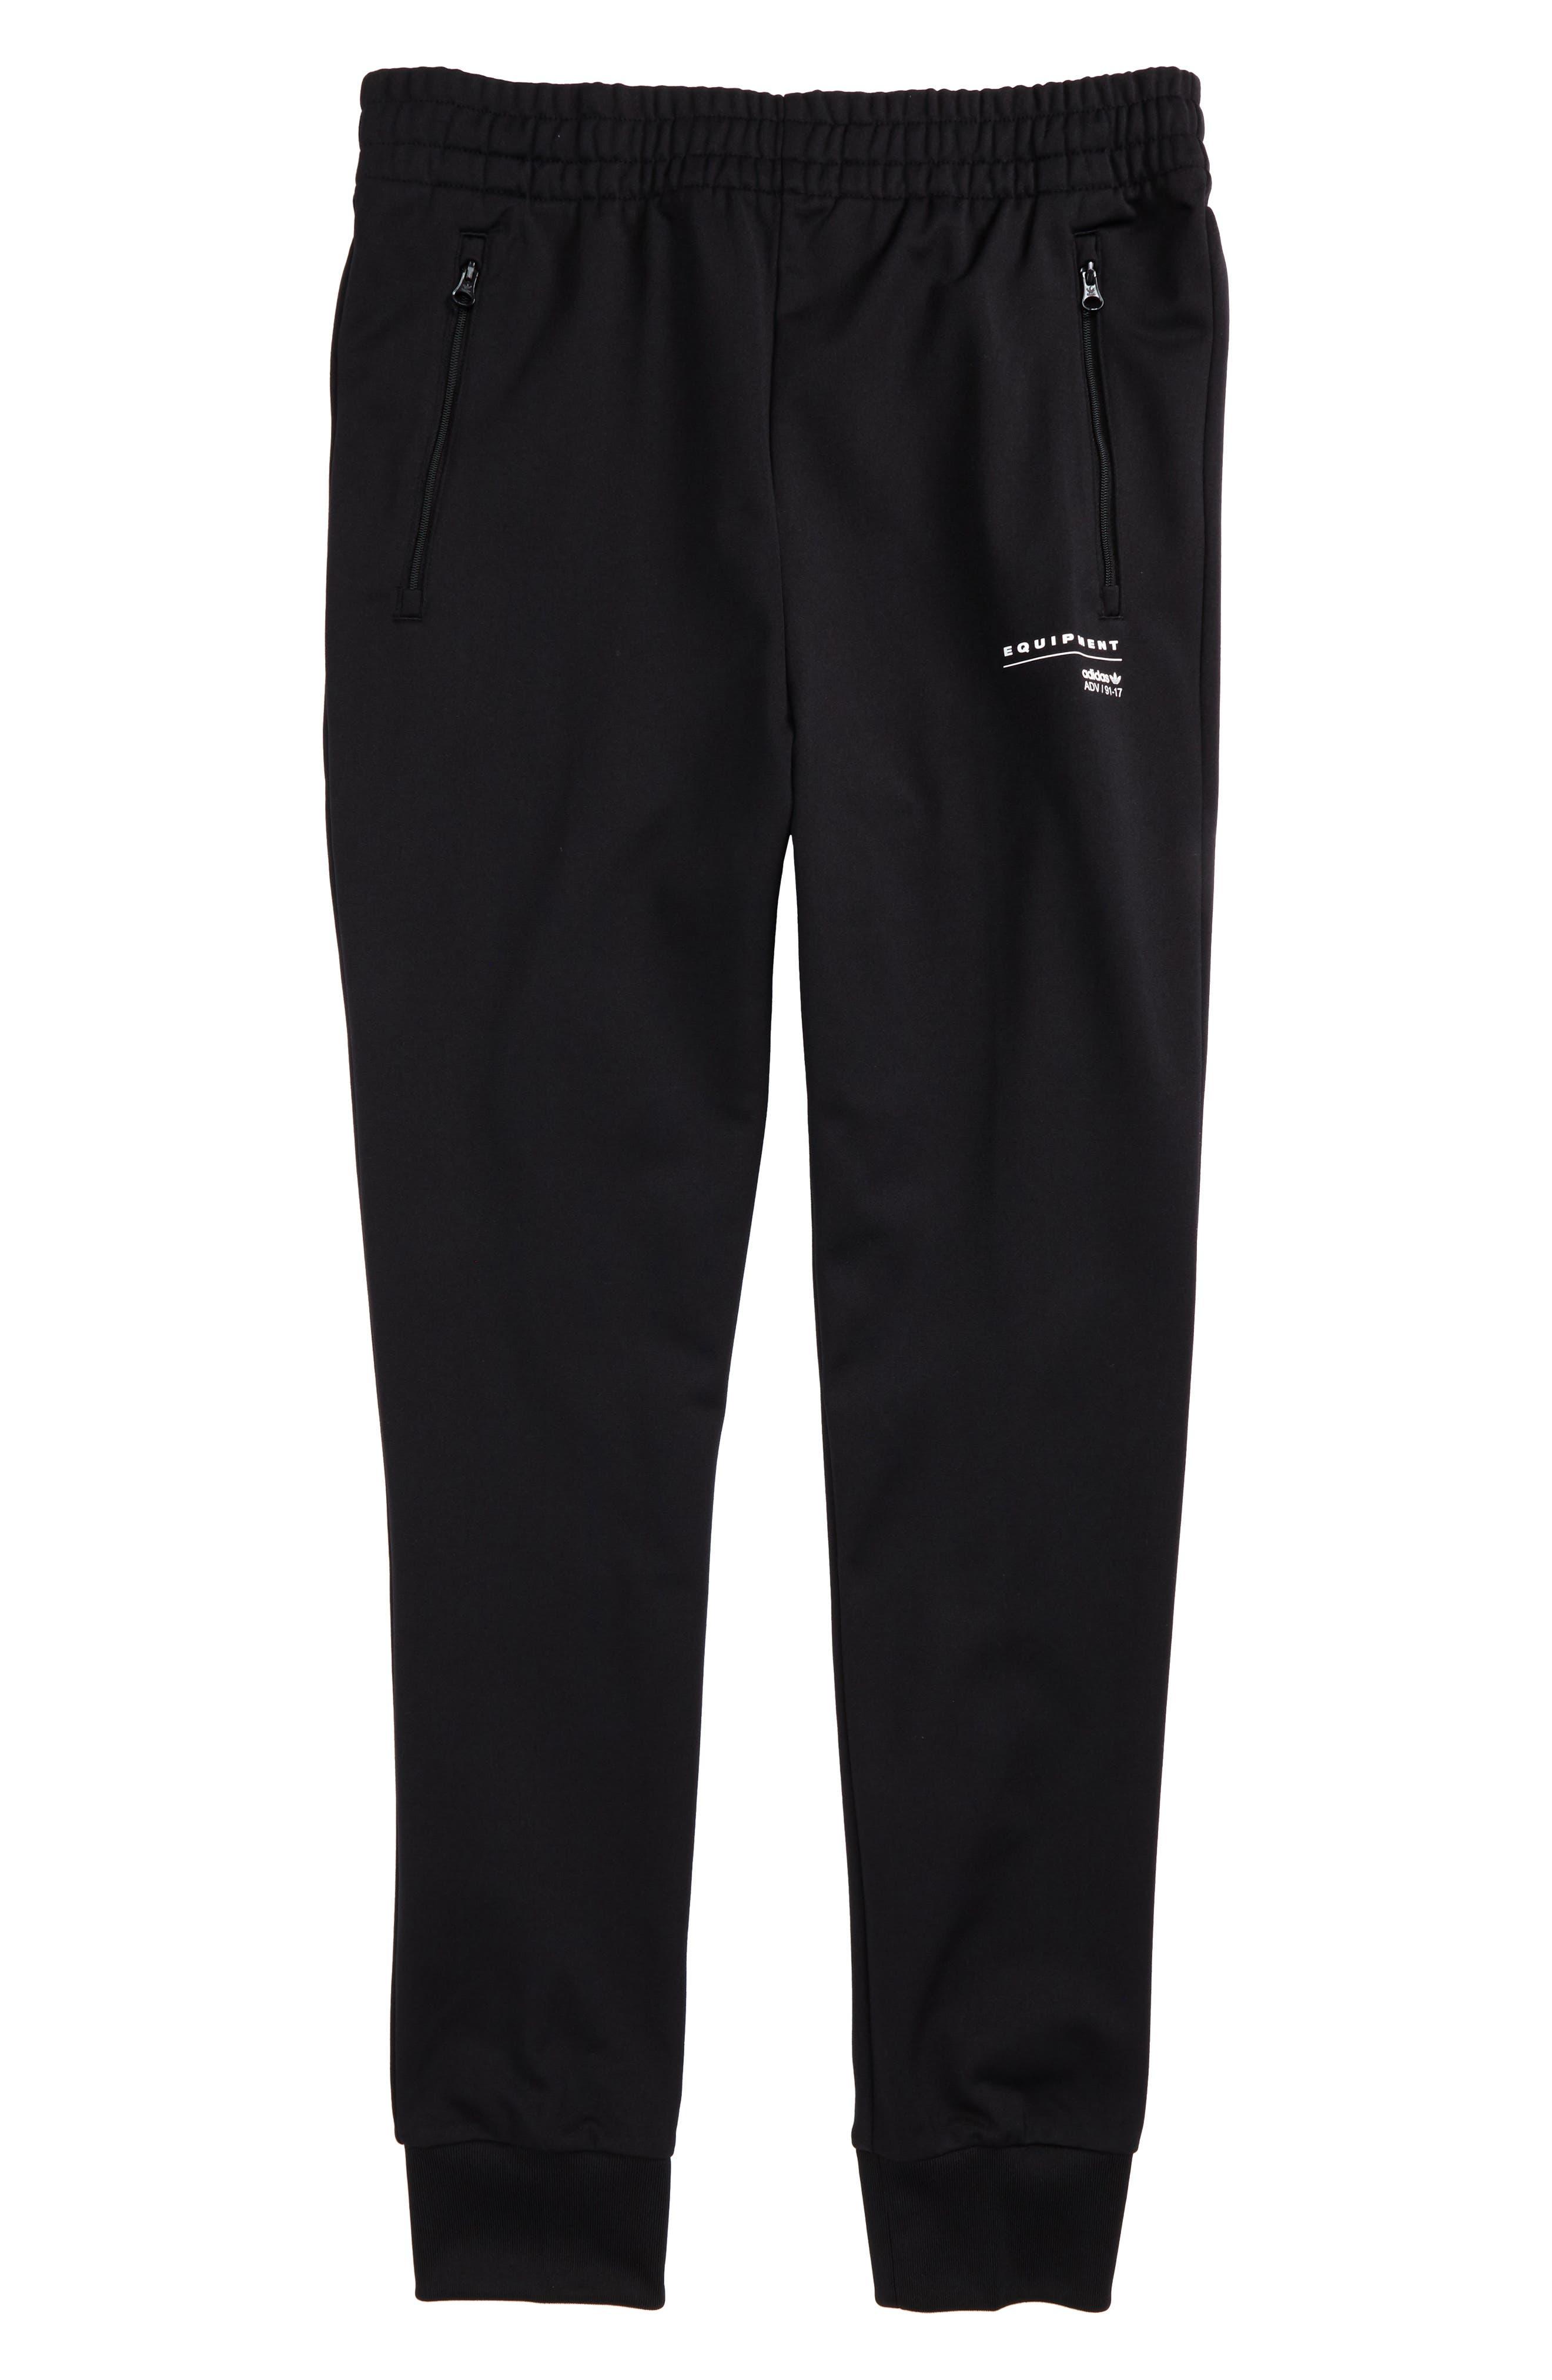 Alternate Image 1 Selected - adidas Originals EQT Tiro Track Pants (Little Boys & Big Boys)